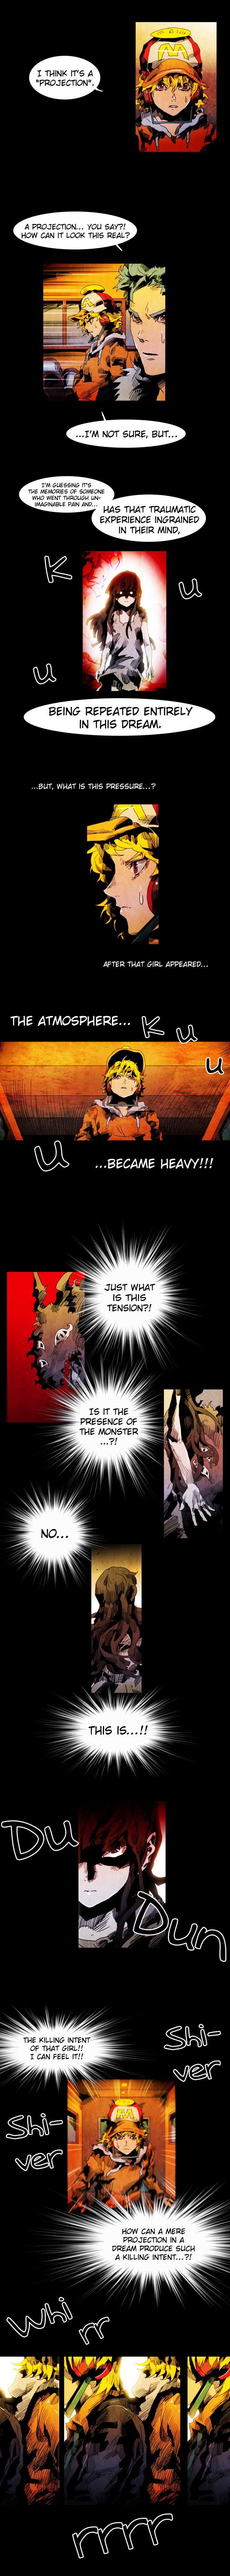 Black Behemoth 20 Page 2